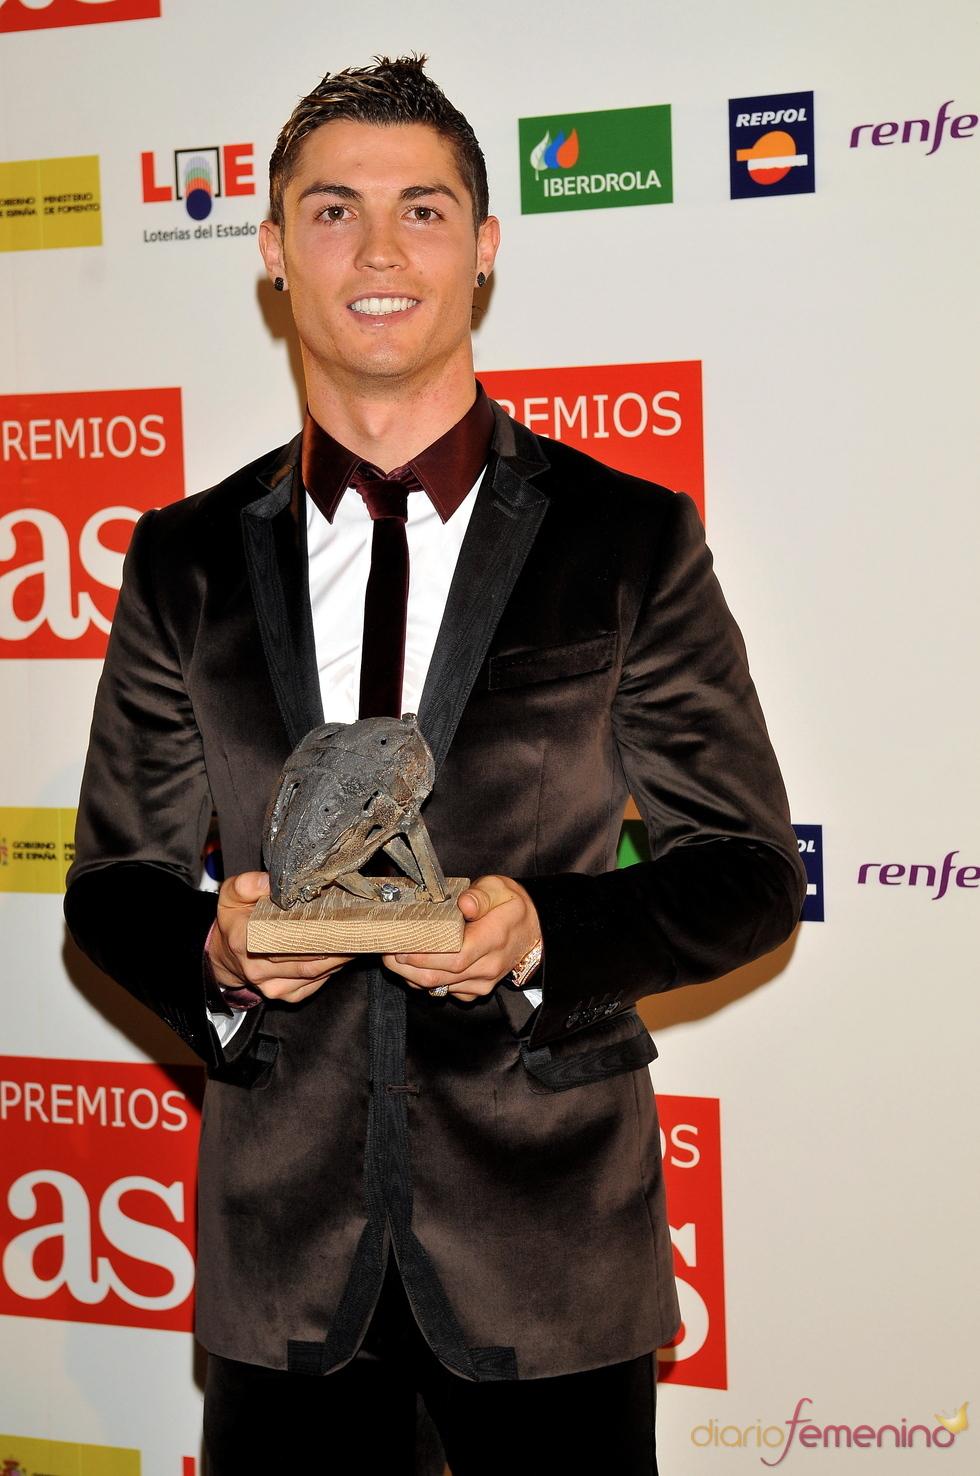 Muchos premios para Cristiano Ronaldo